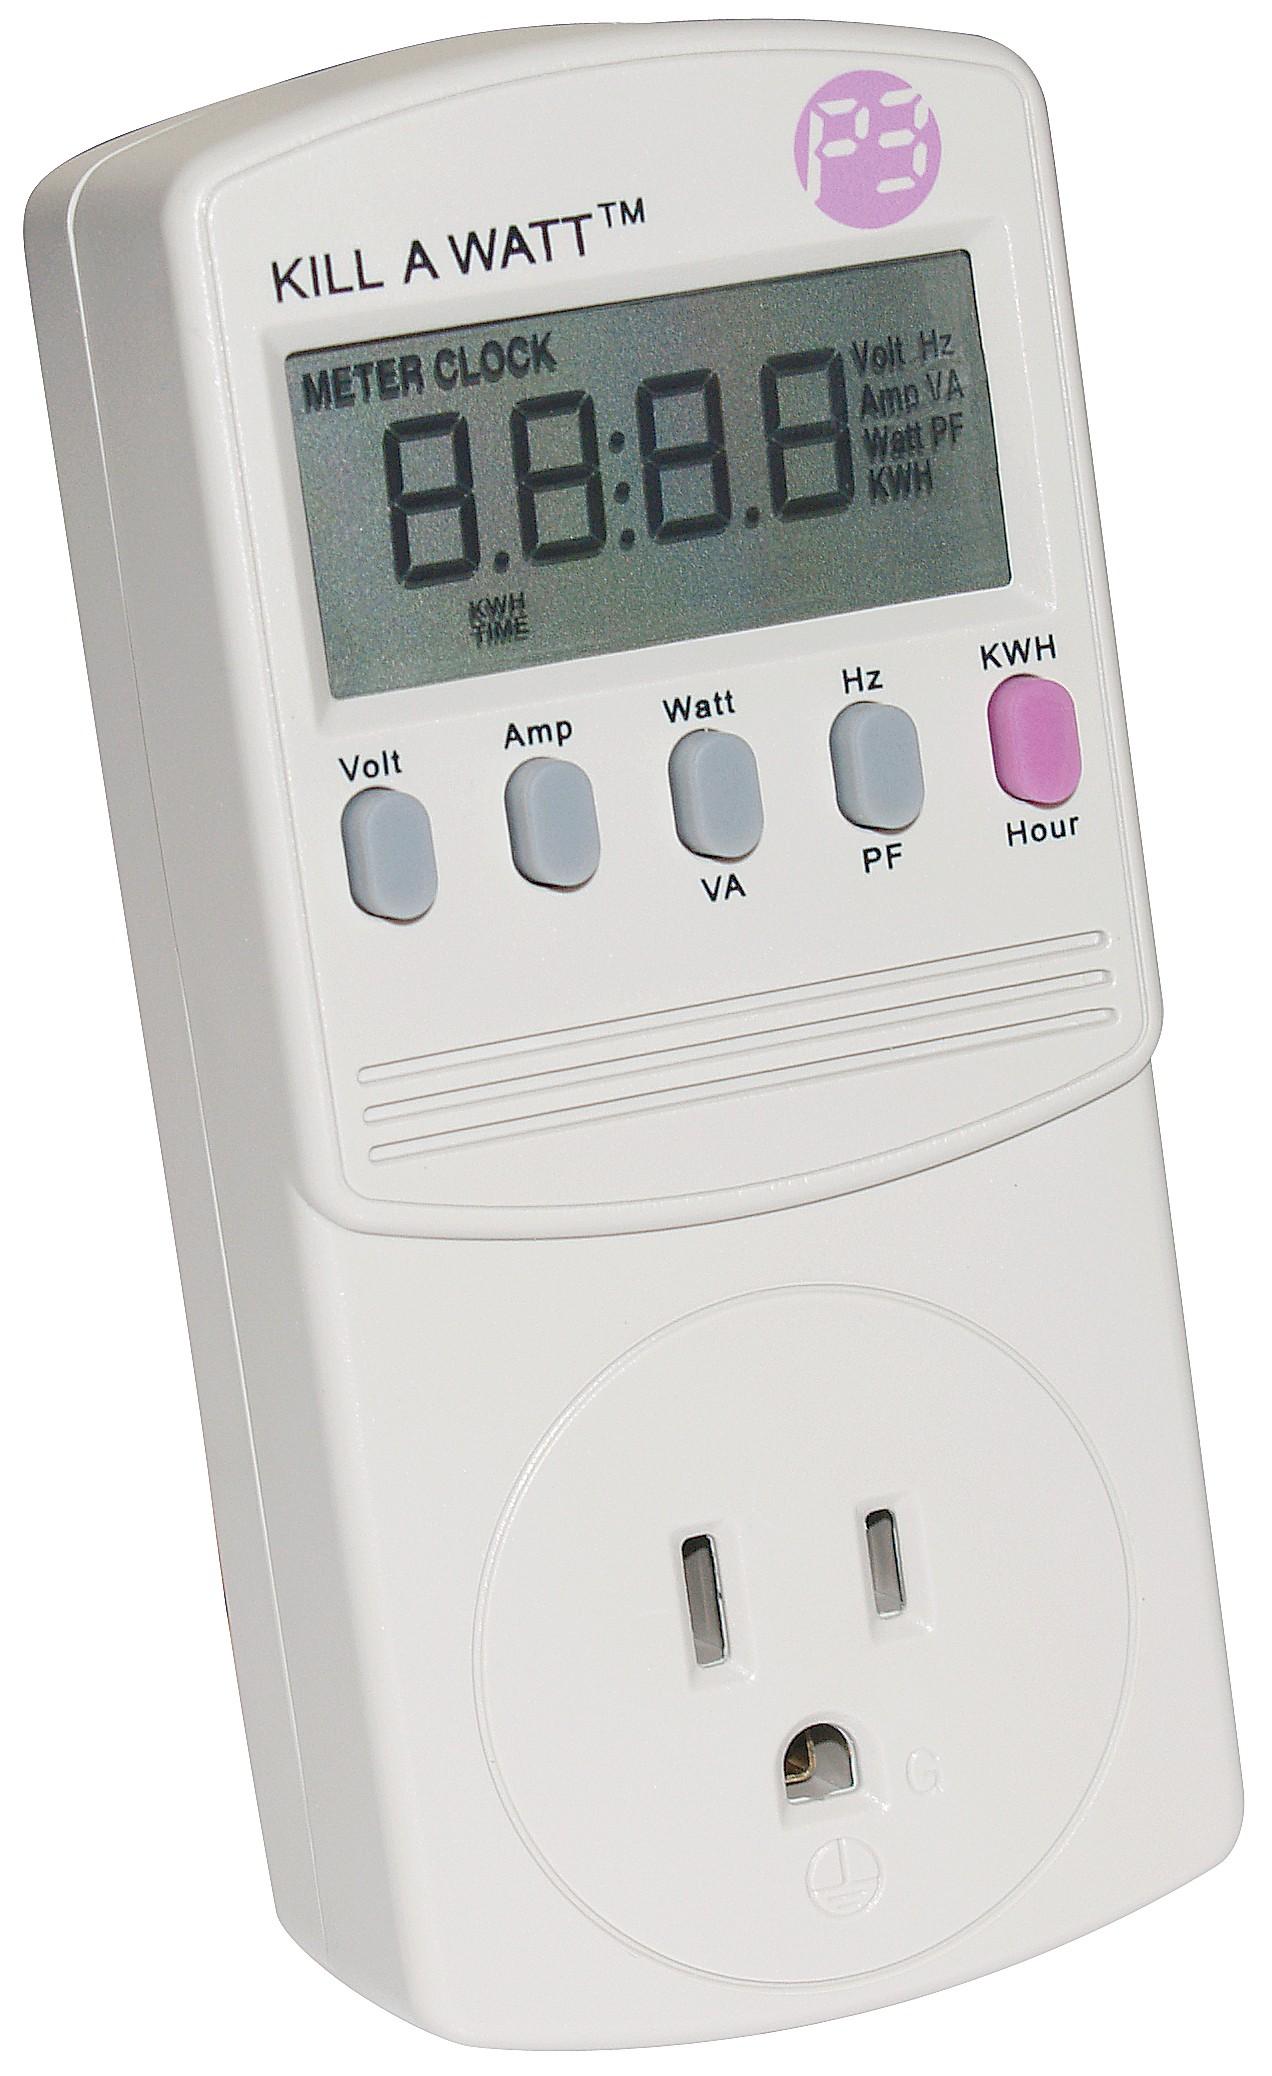 P4400 Kill a Watt, Electricity usage monitor